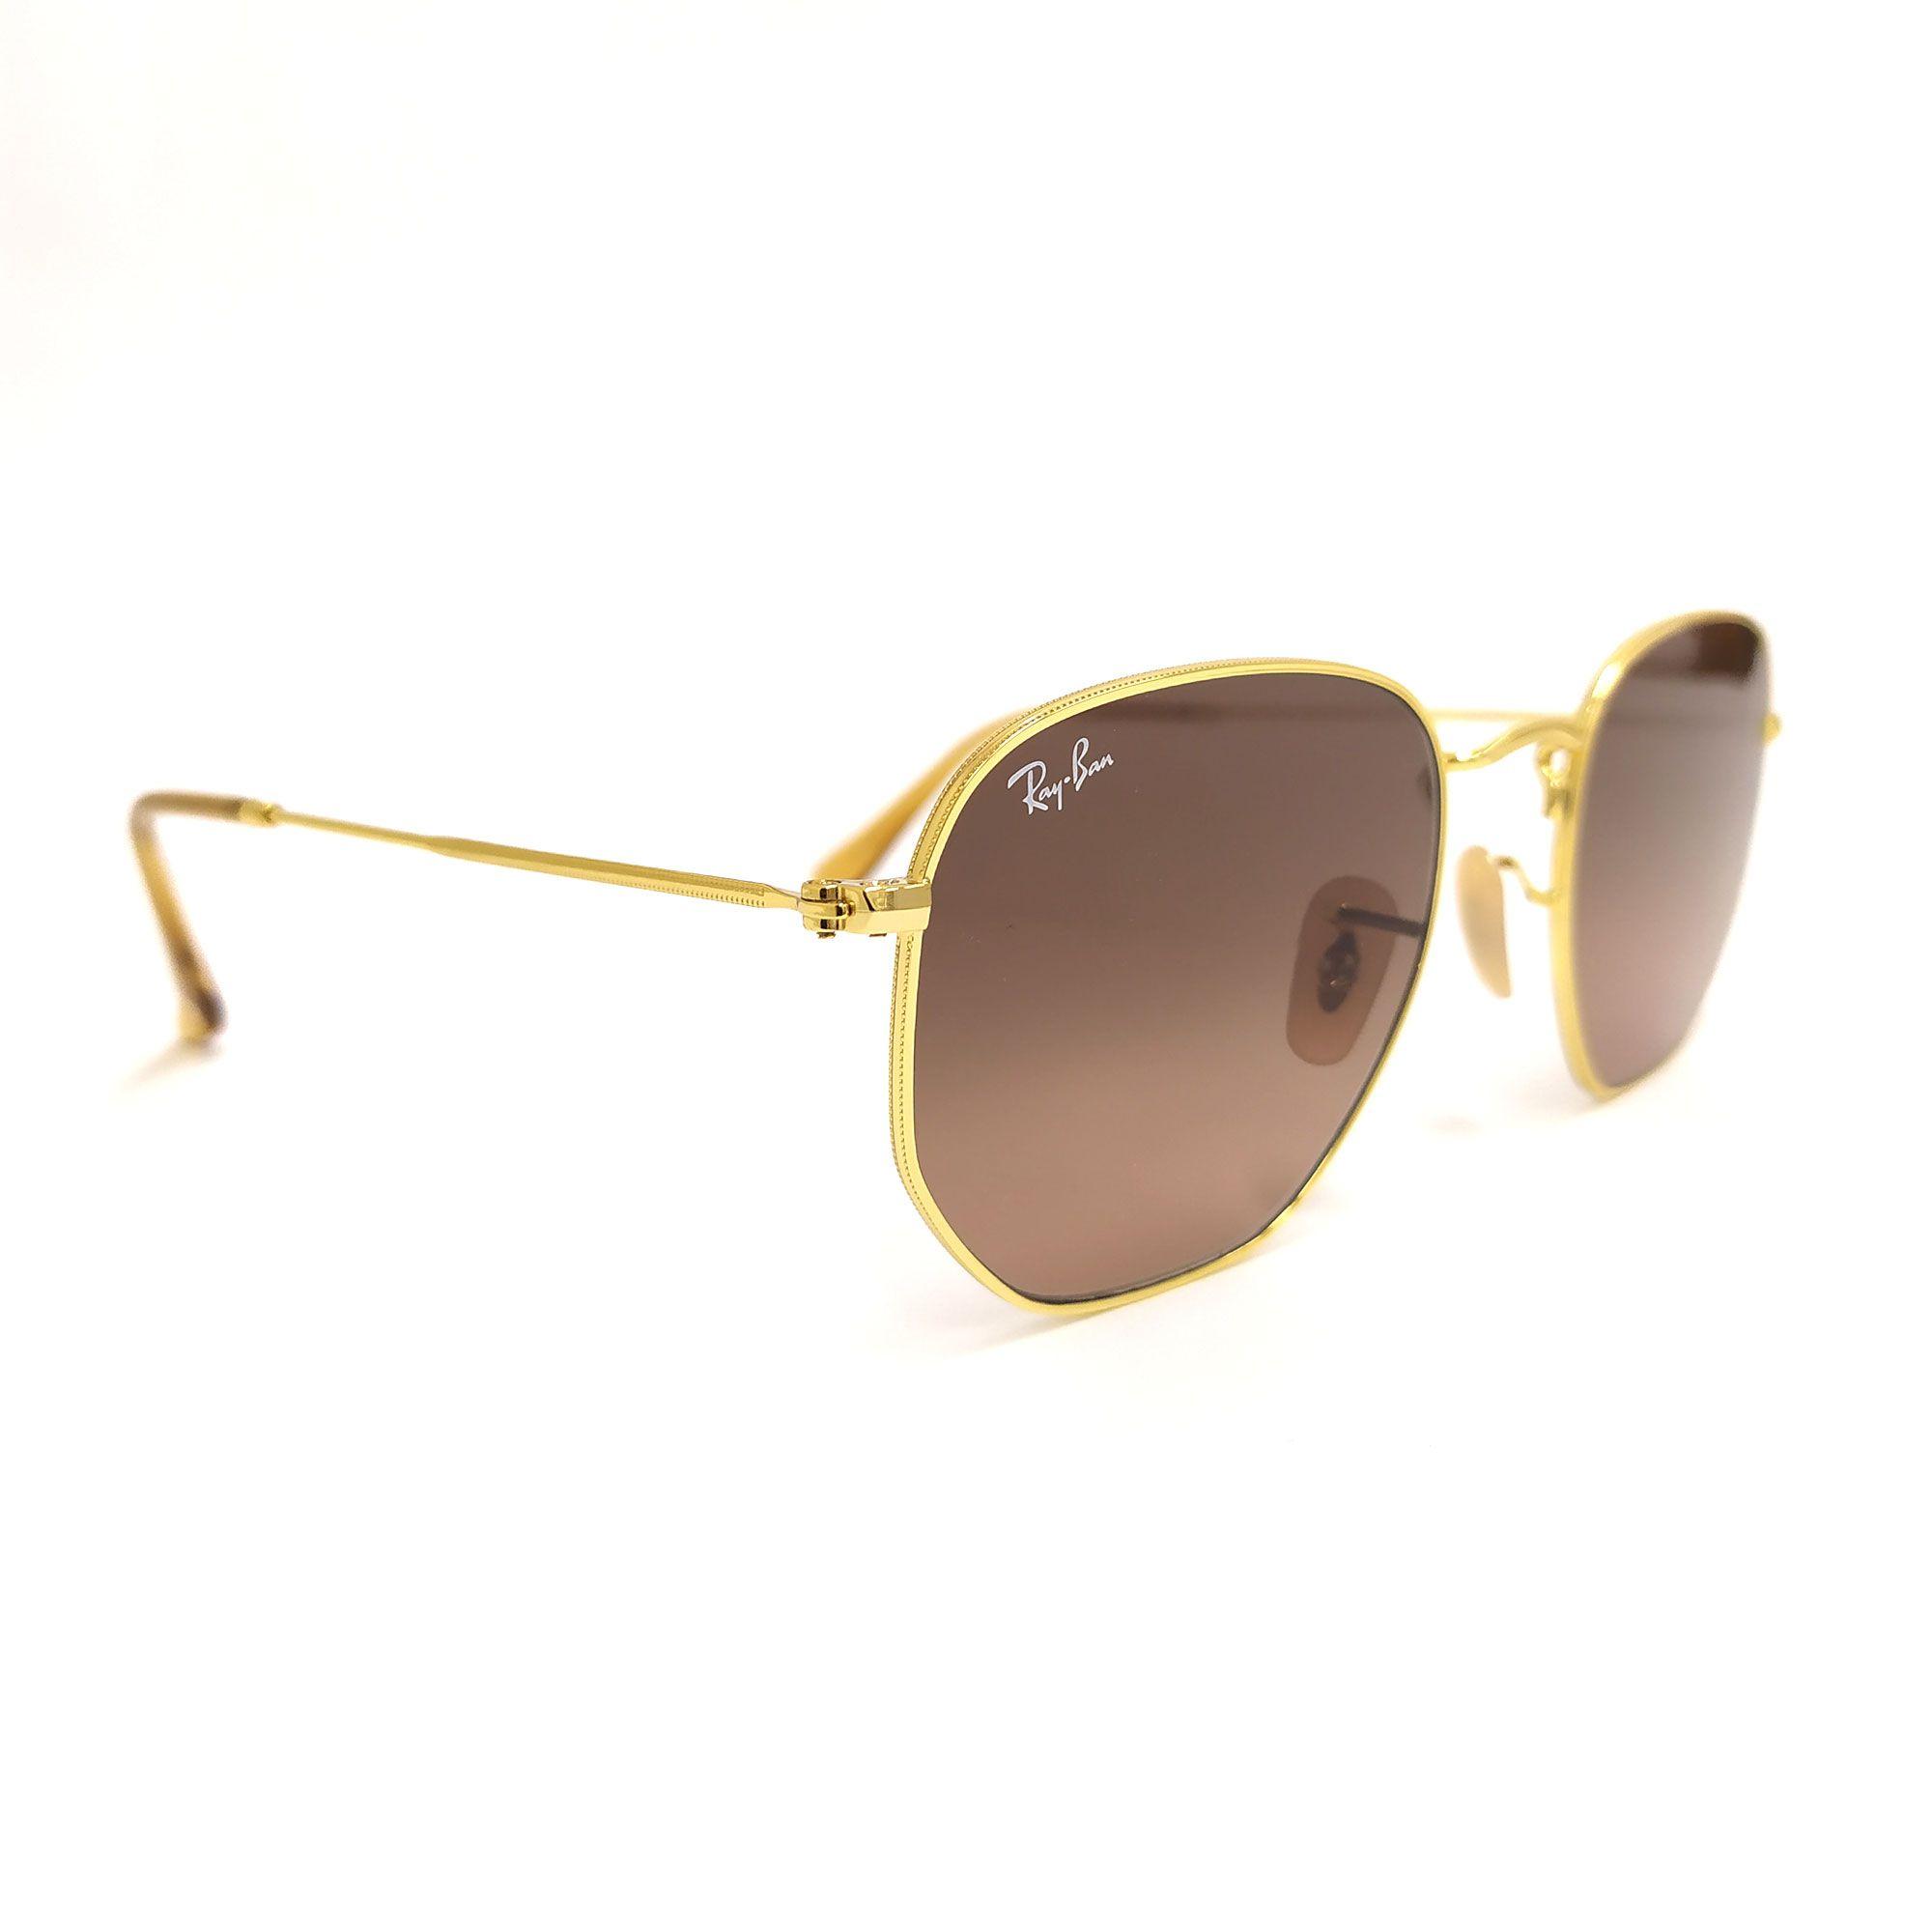 Óculos de Sol Ray-Ban Hexagonal Dourado com Lente Marrom 3548-N